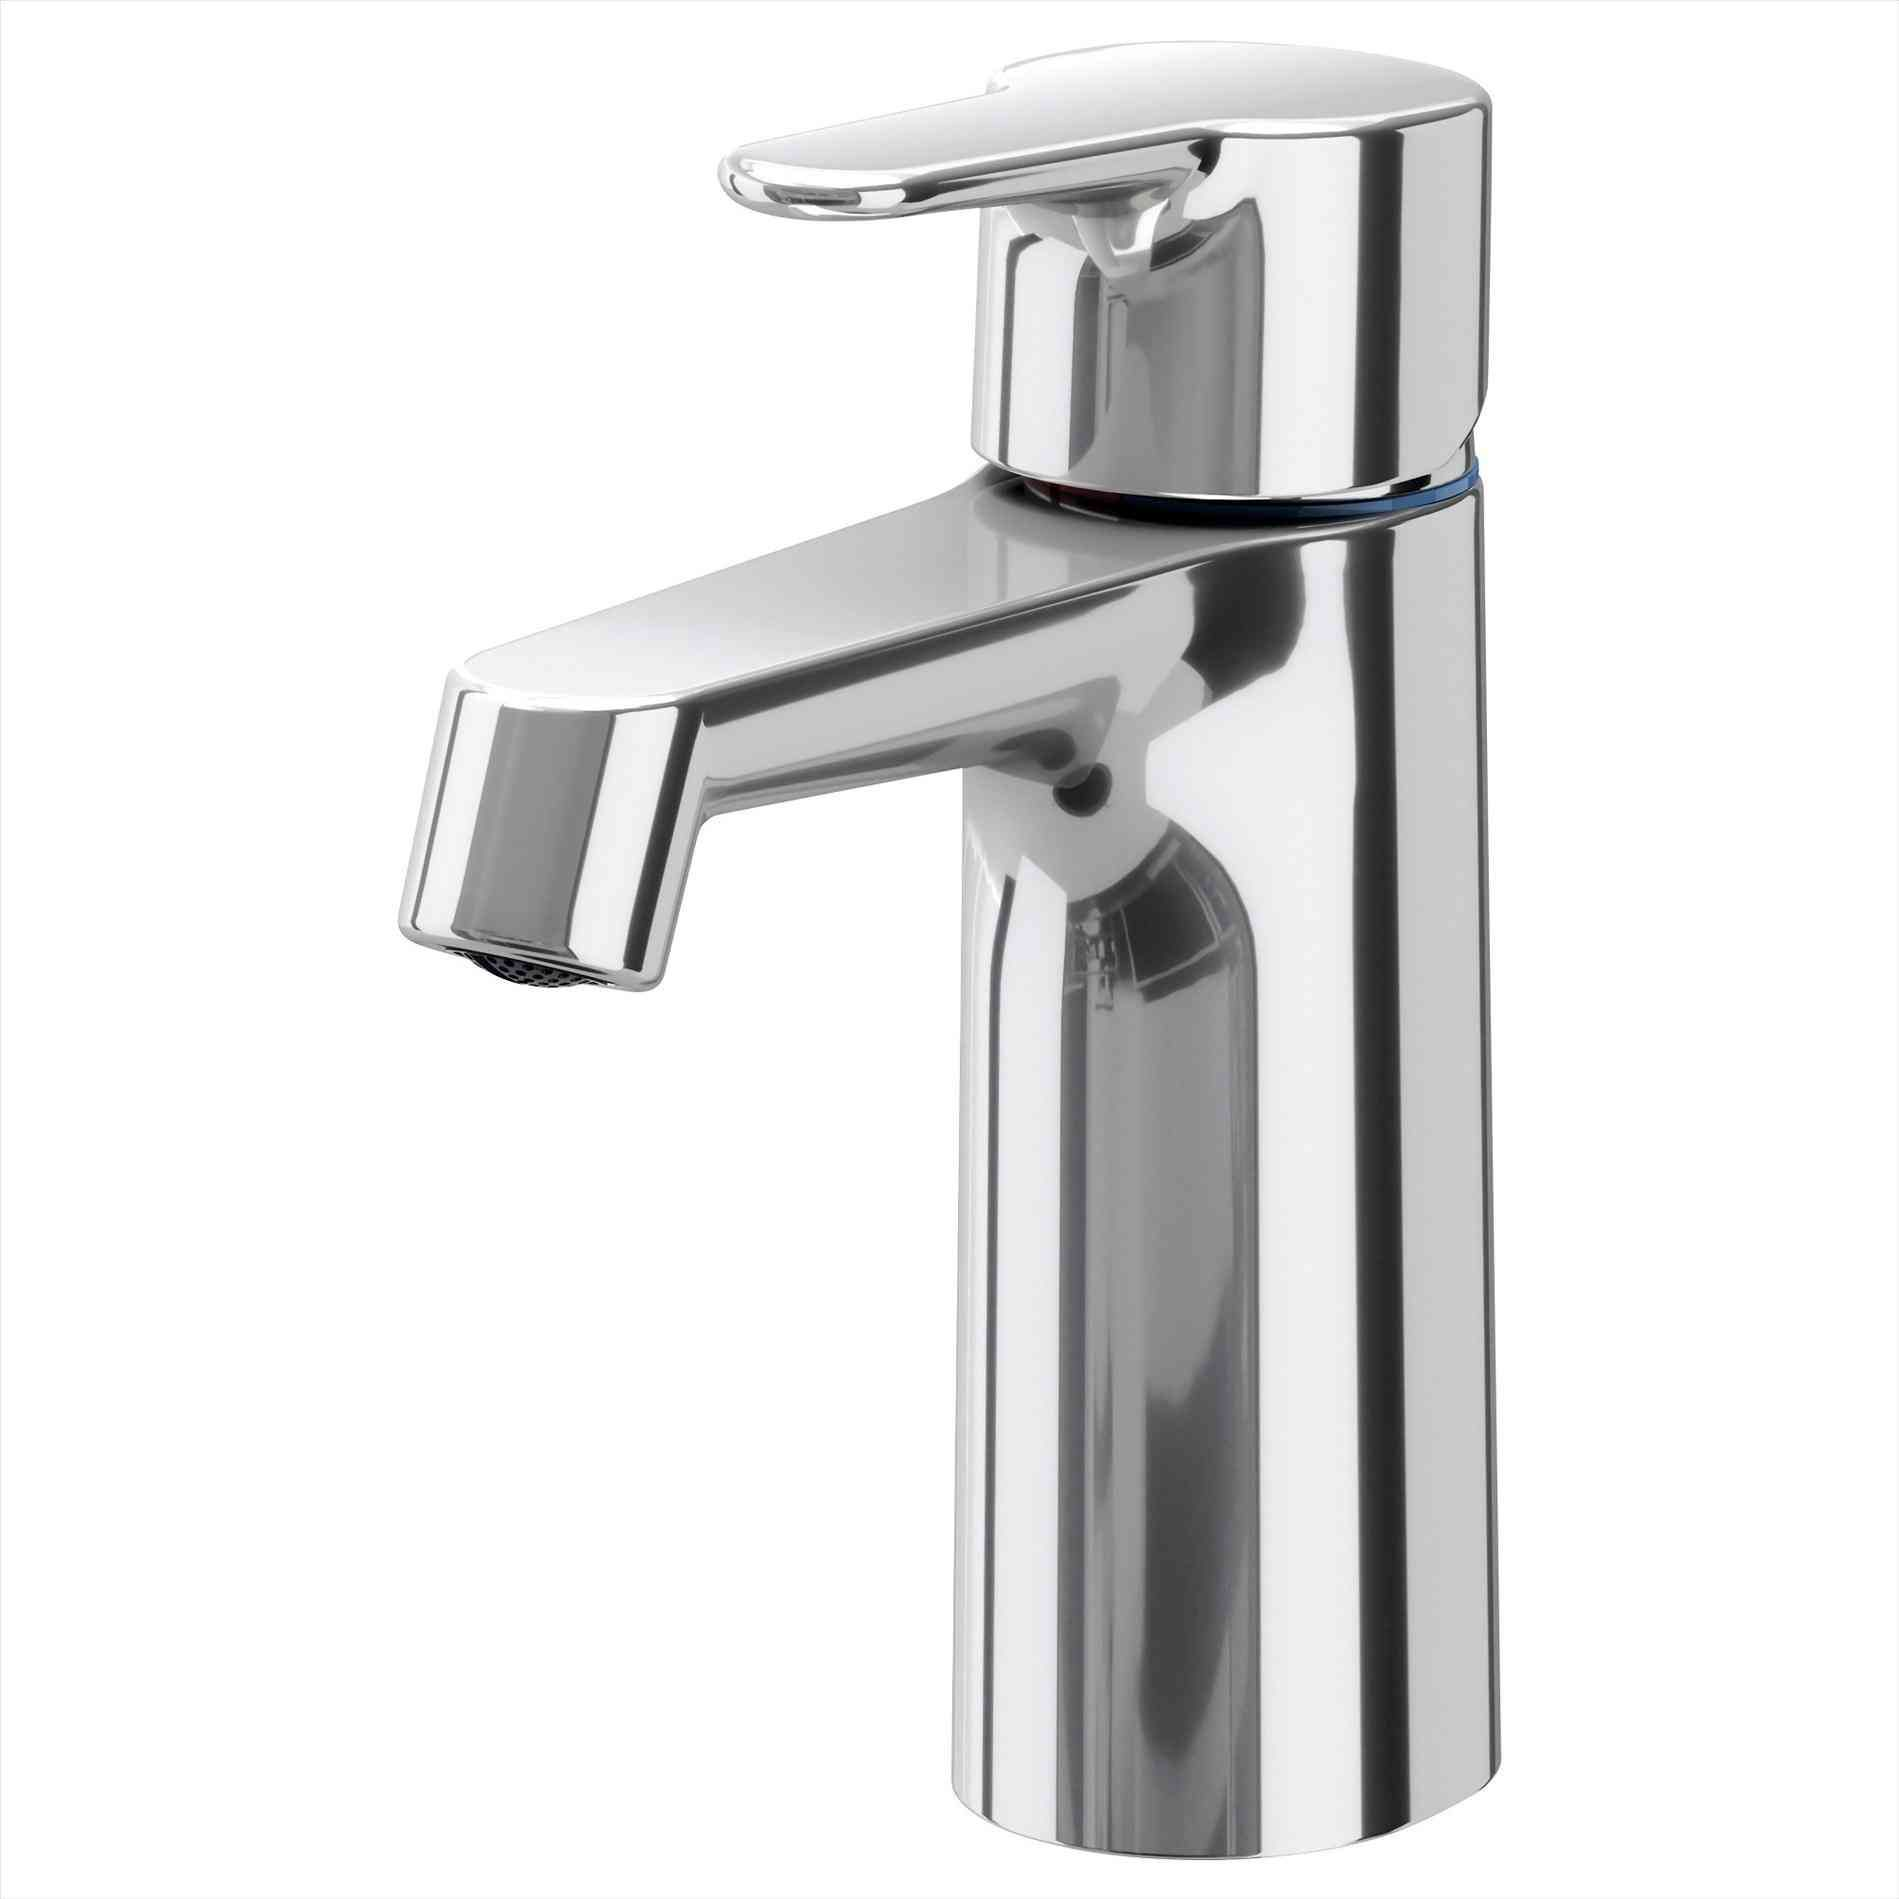 New Post ikea faucet bathroom | Bathroom_Ideas | Pinterest | Faucet ...